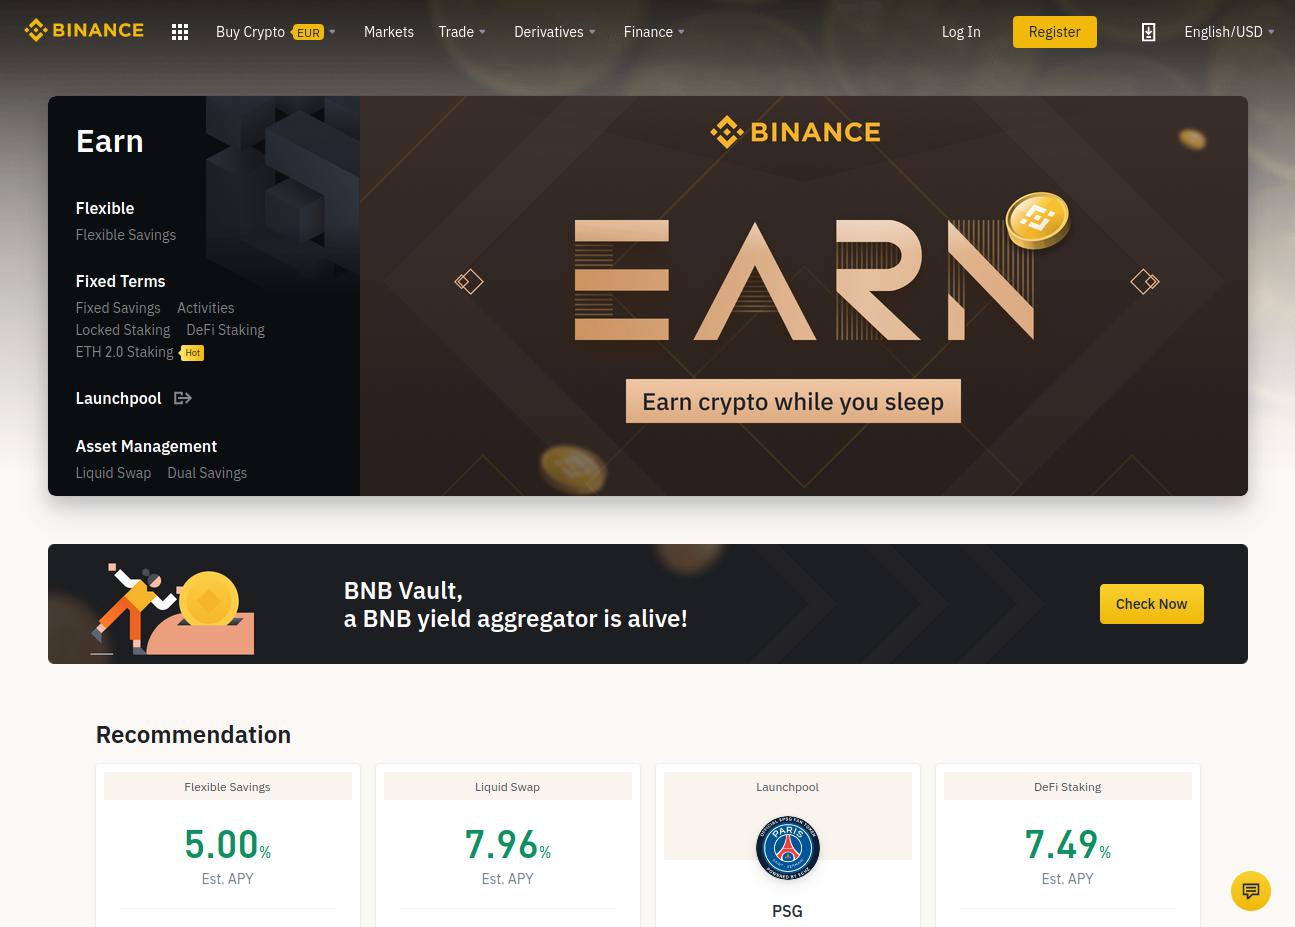 Binance crypto banking platform